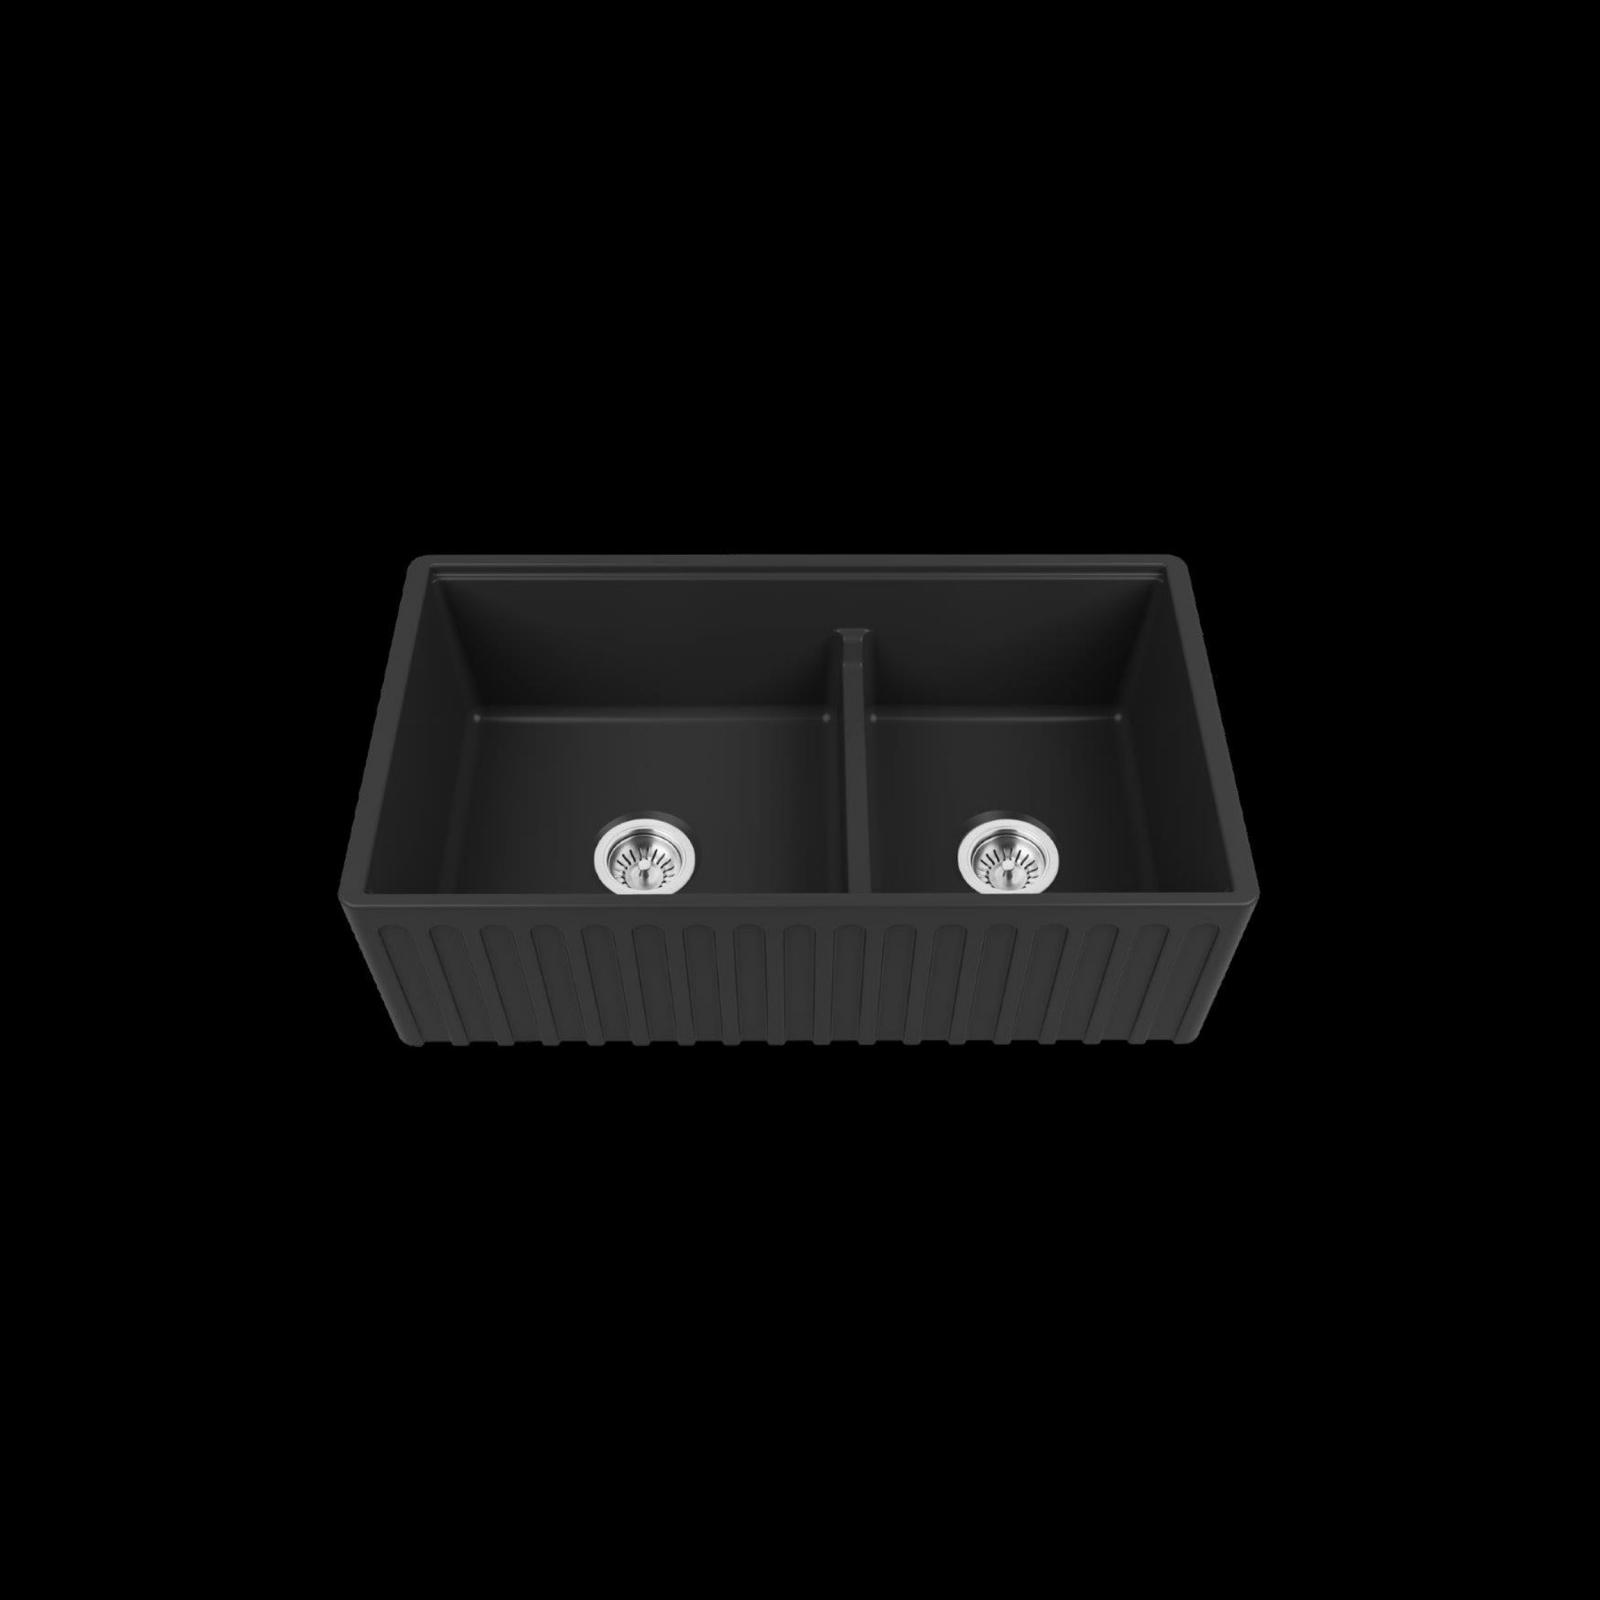 High-quality sink Louis Le Grand II black - single bowl, ceramic